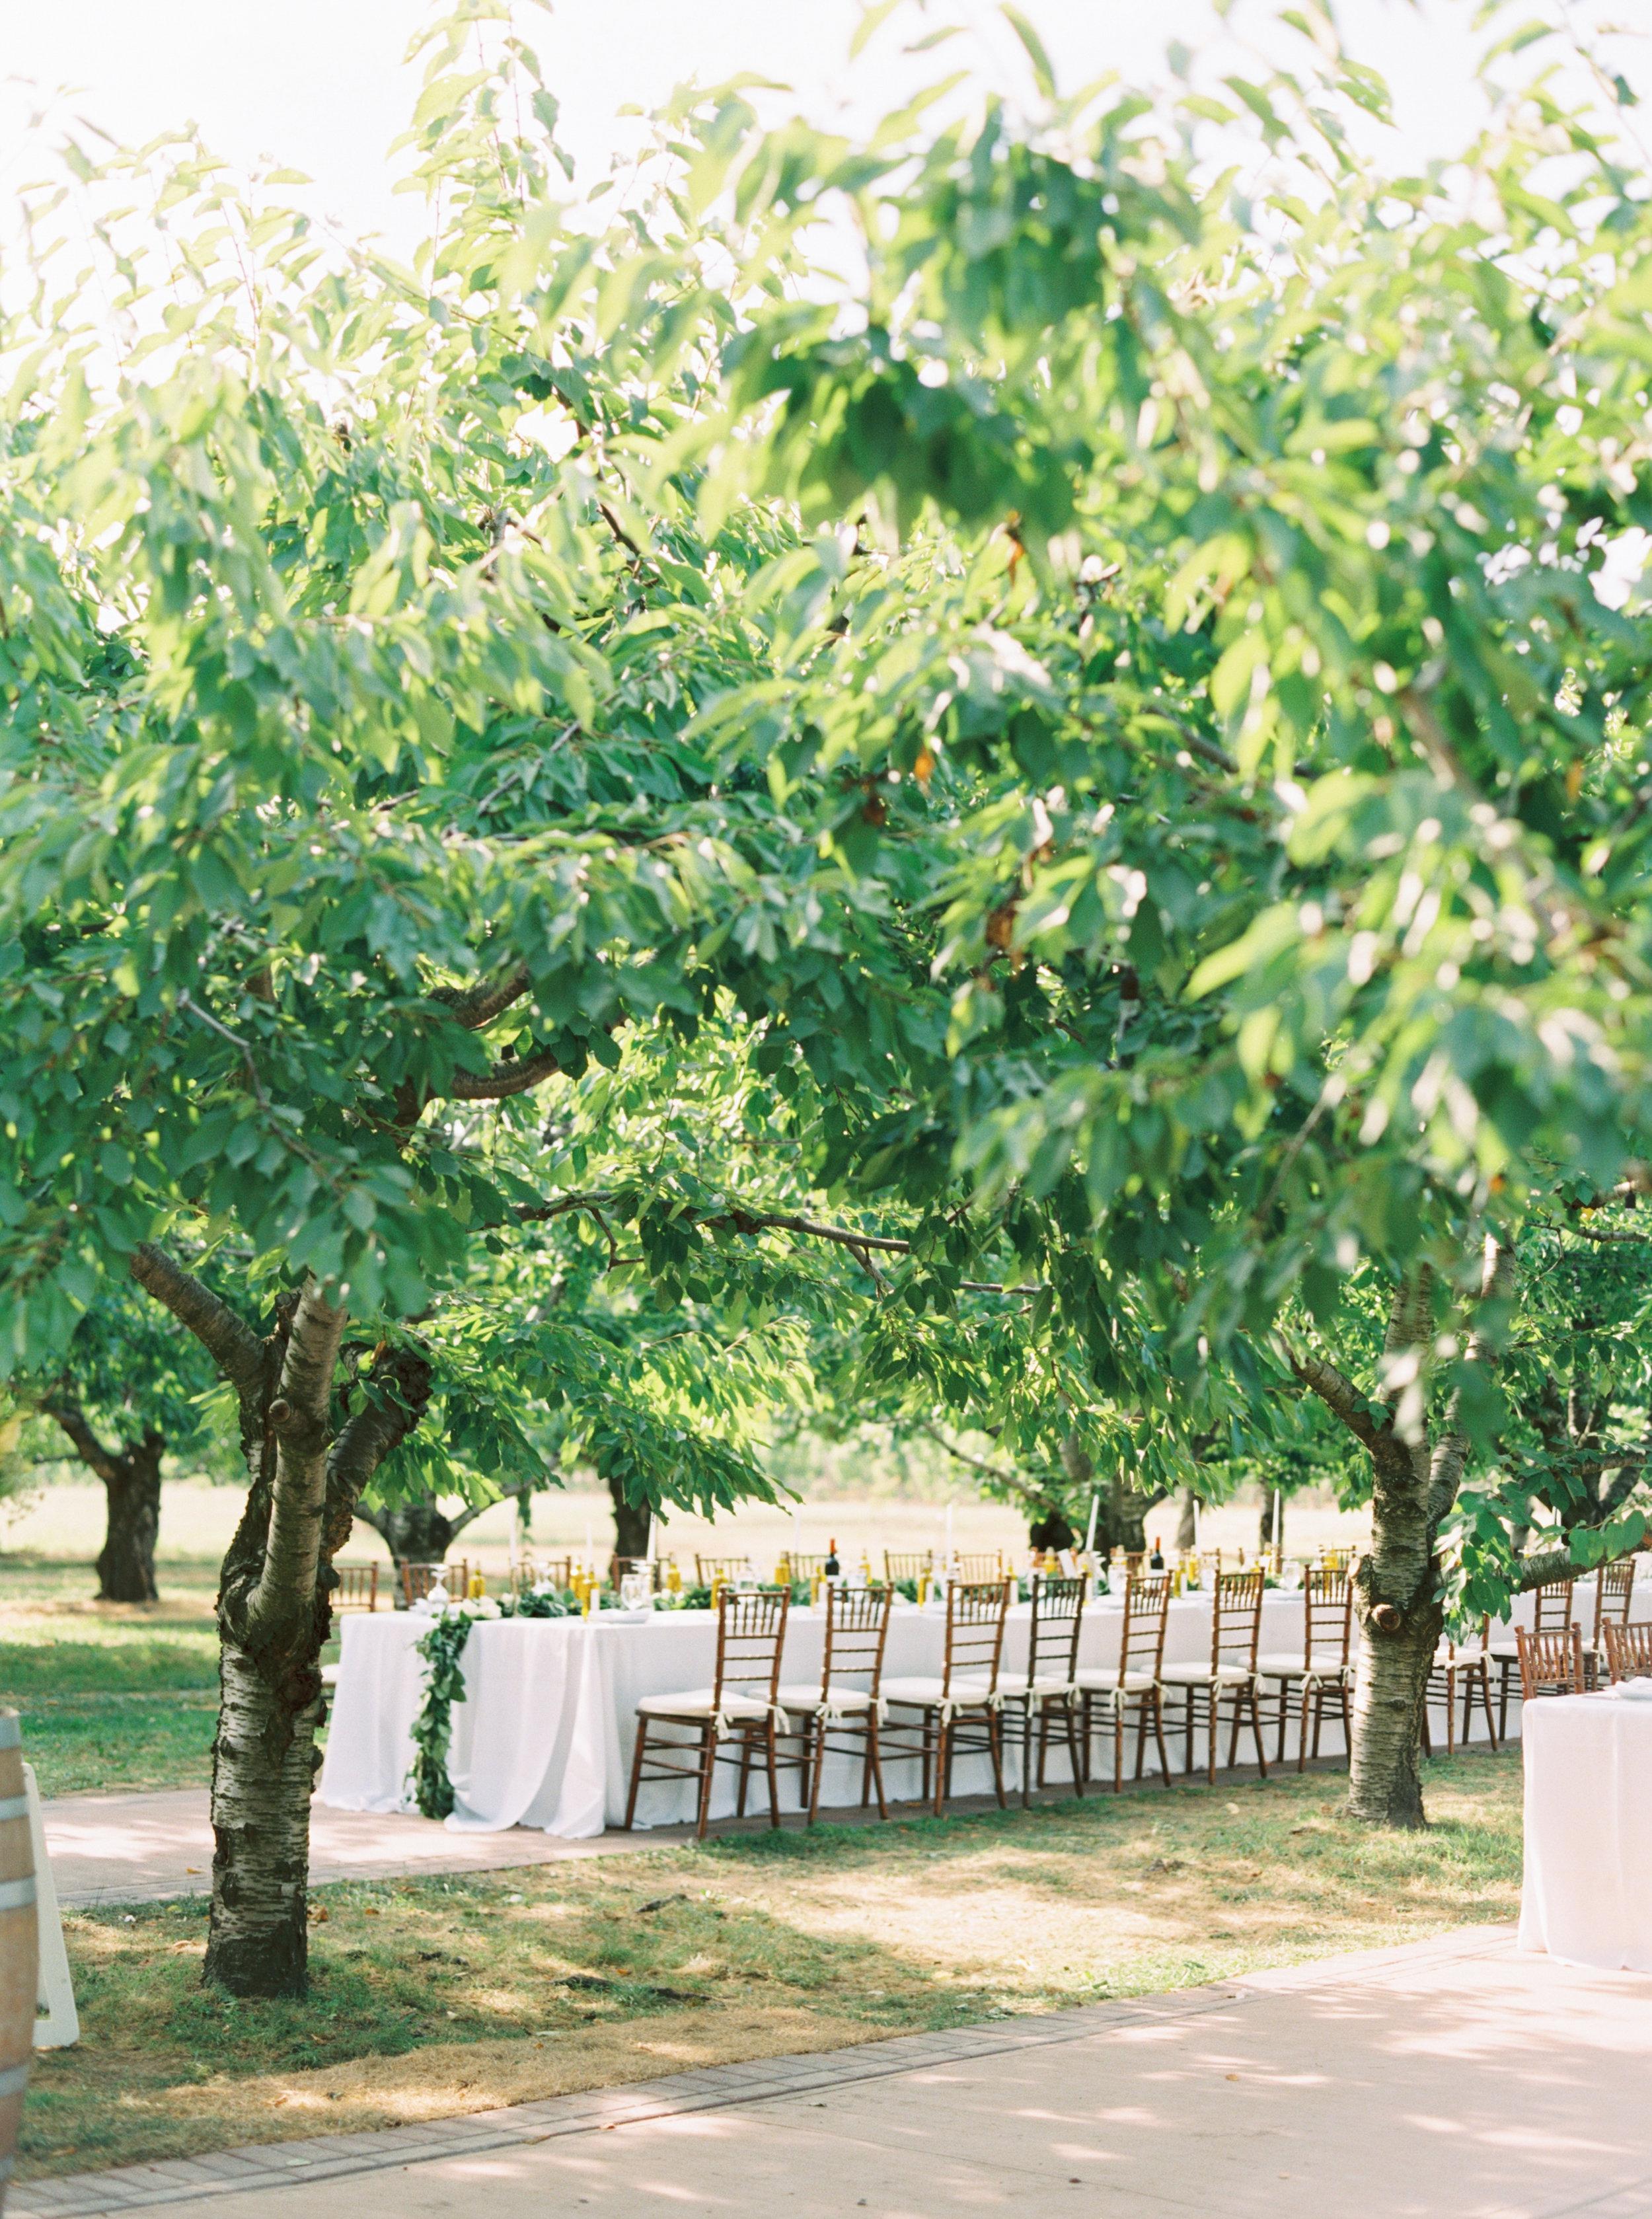 gracewood-kurtz-orchards-toronto-wedding-photographer-kurtz-film-richelle-hunter-cassandra-zac-dalpe-previews-30.jpg